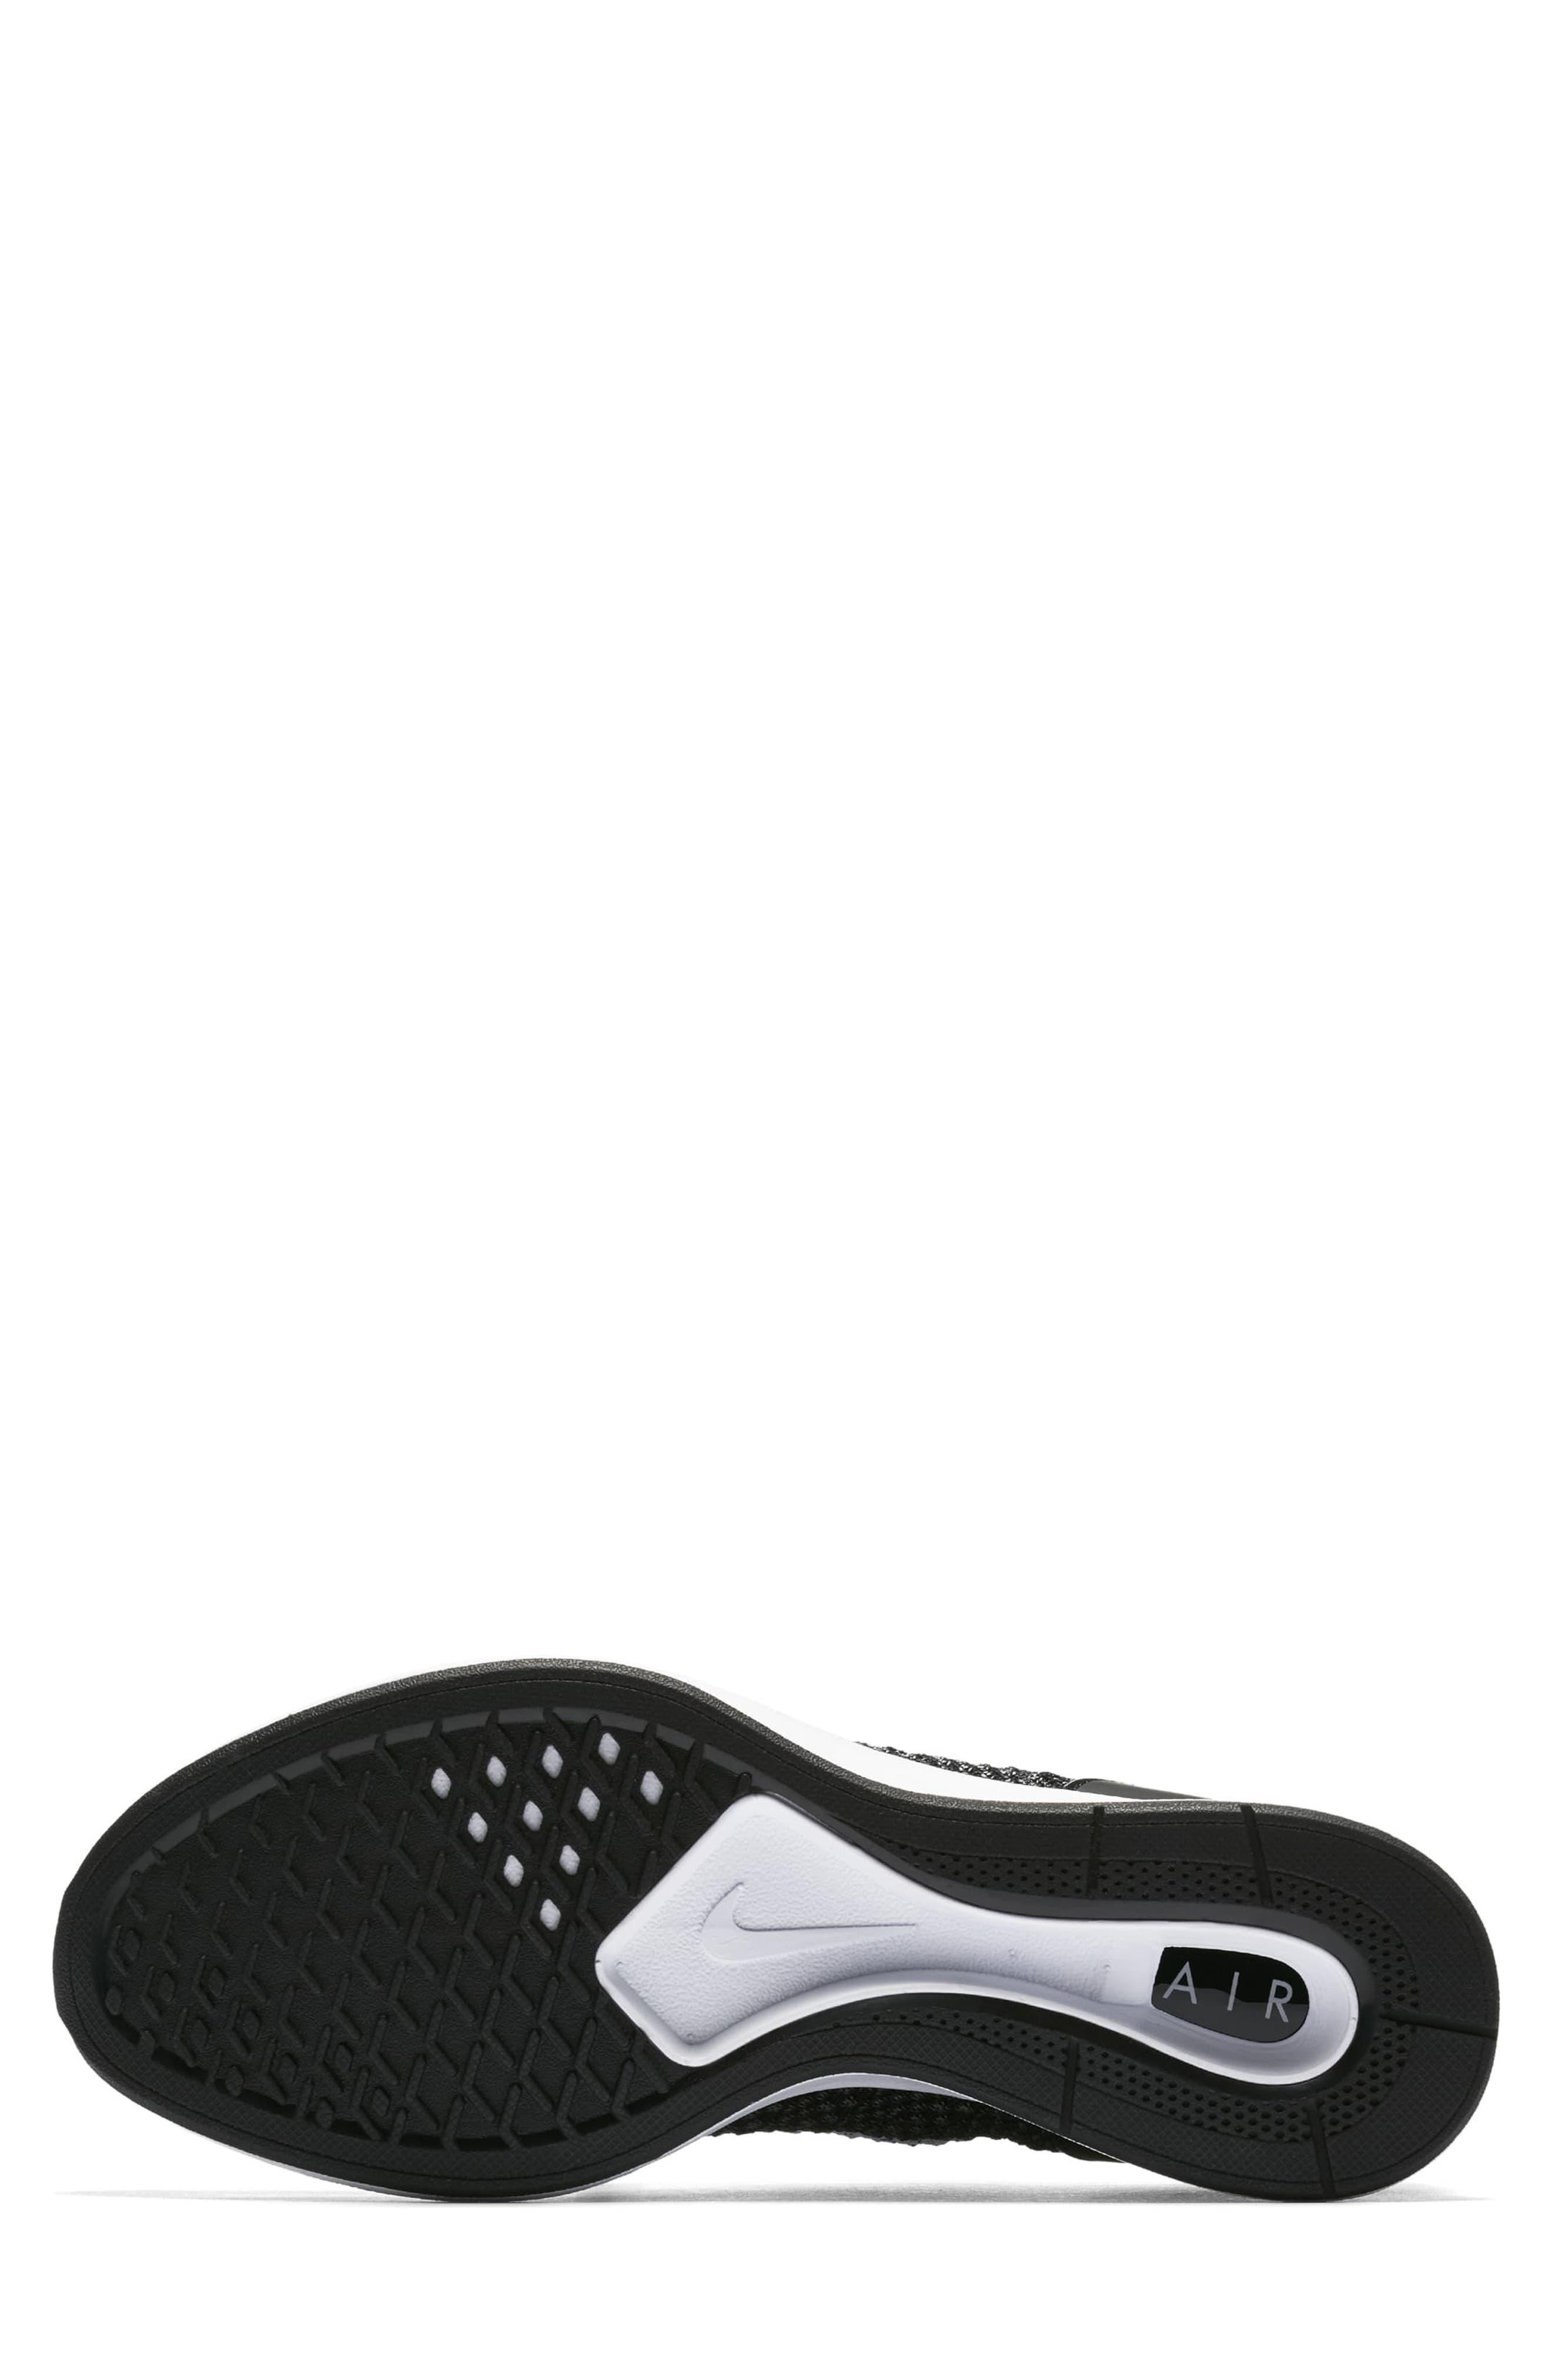 Alternate Image 4  - Nike Air Zoom Mariah Flyknit Racer Sneaker (Women)